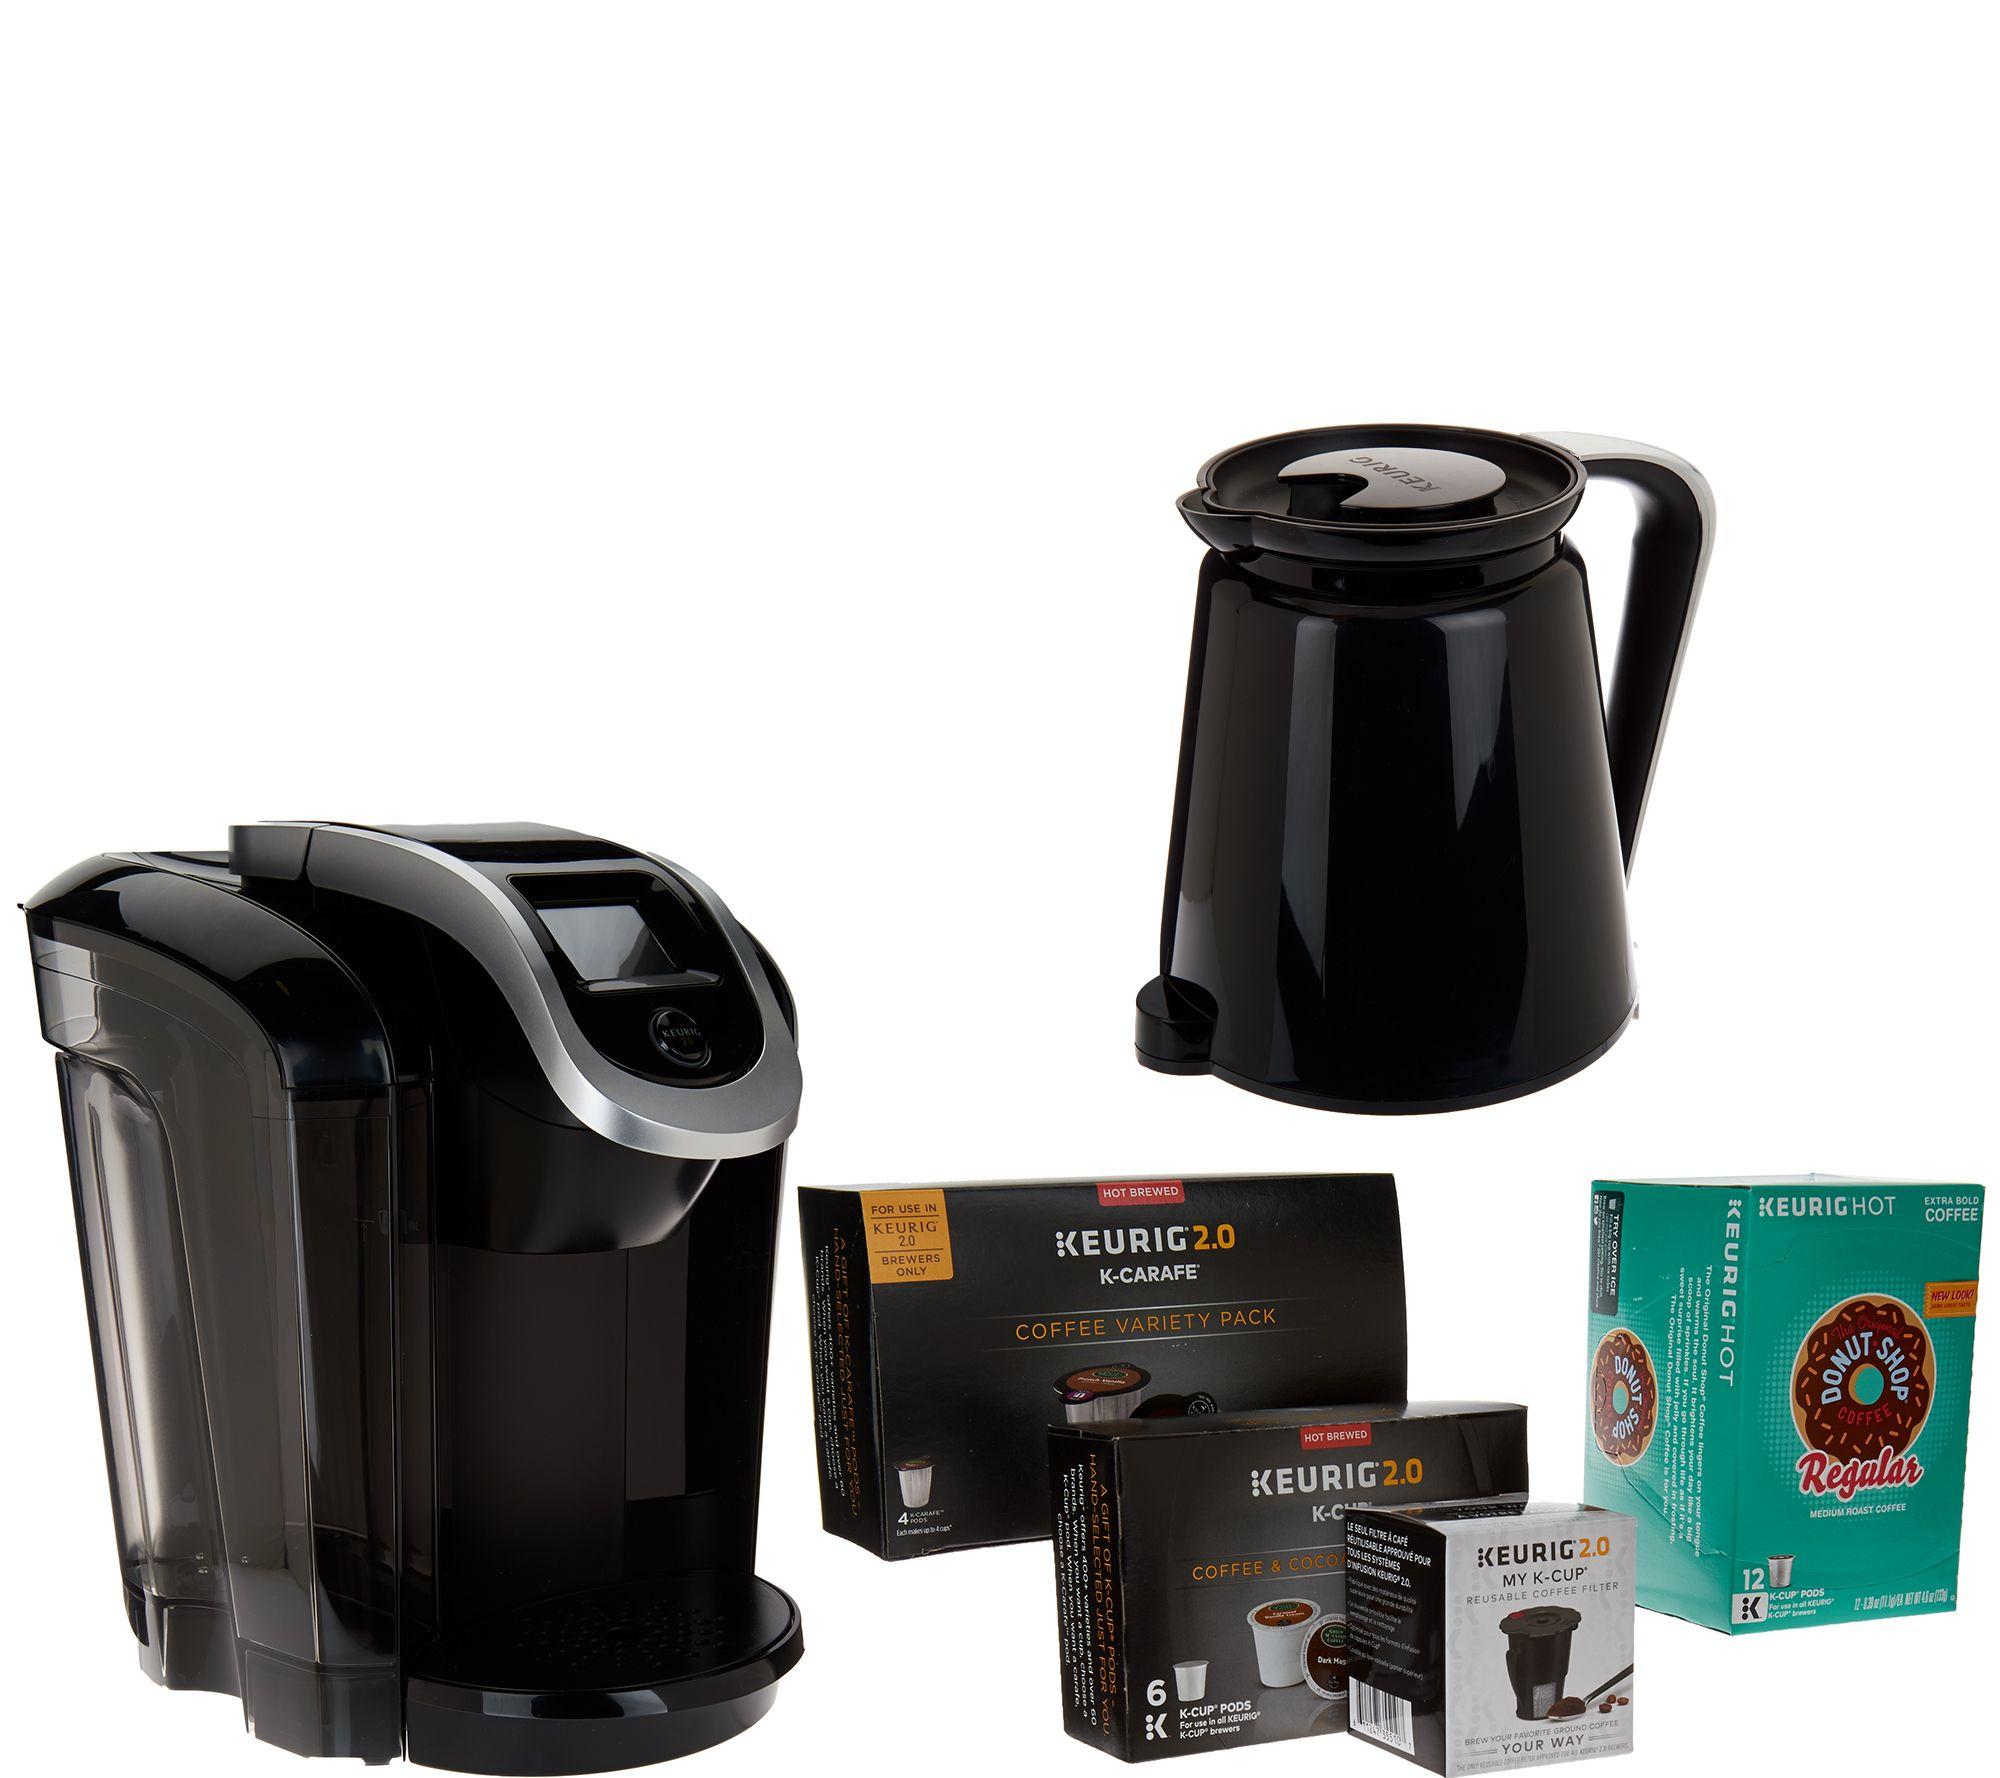 Keurig 2.0 K350 Coffee Maker with My K-Cup, 18 K-Cup Packs, & 4 K-Carafes - Page 1 QVC.com